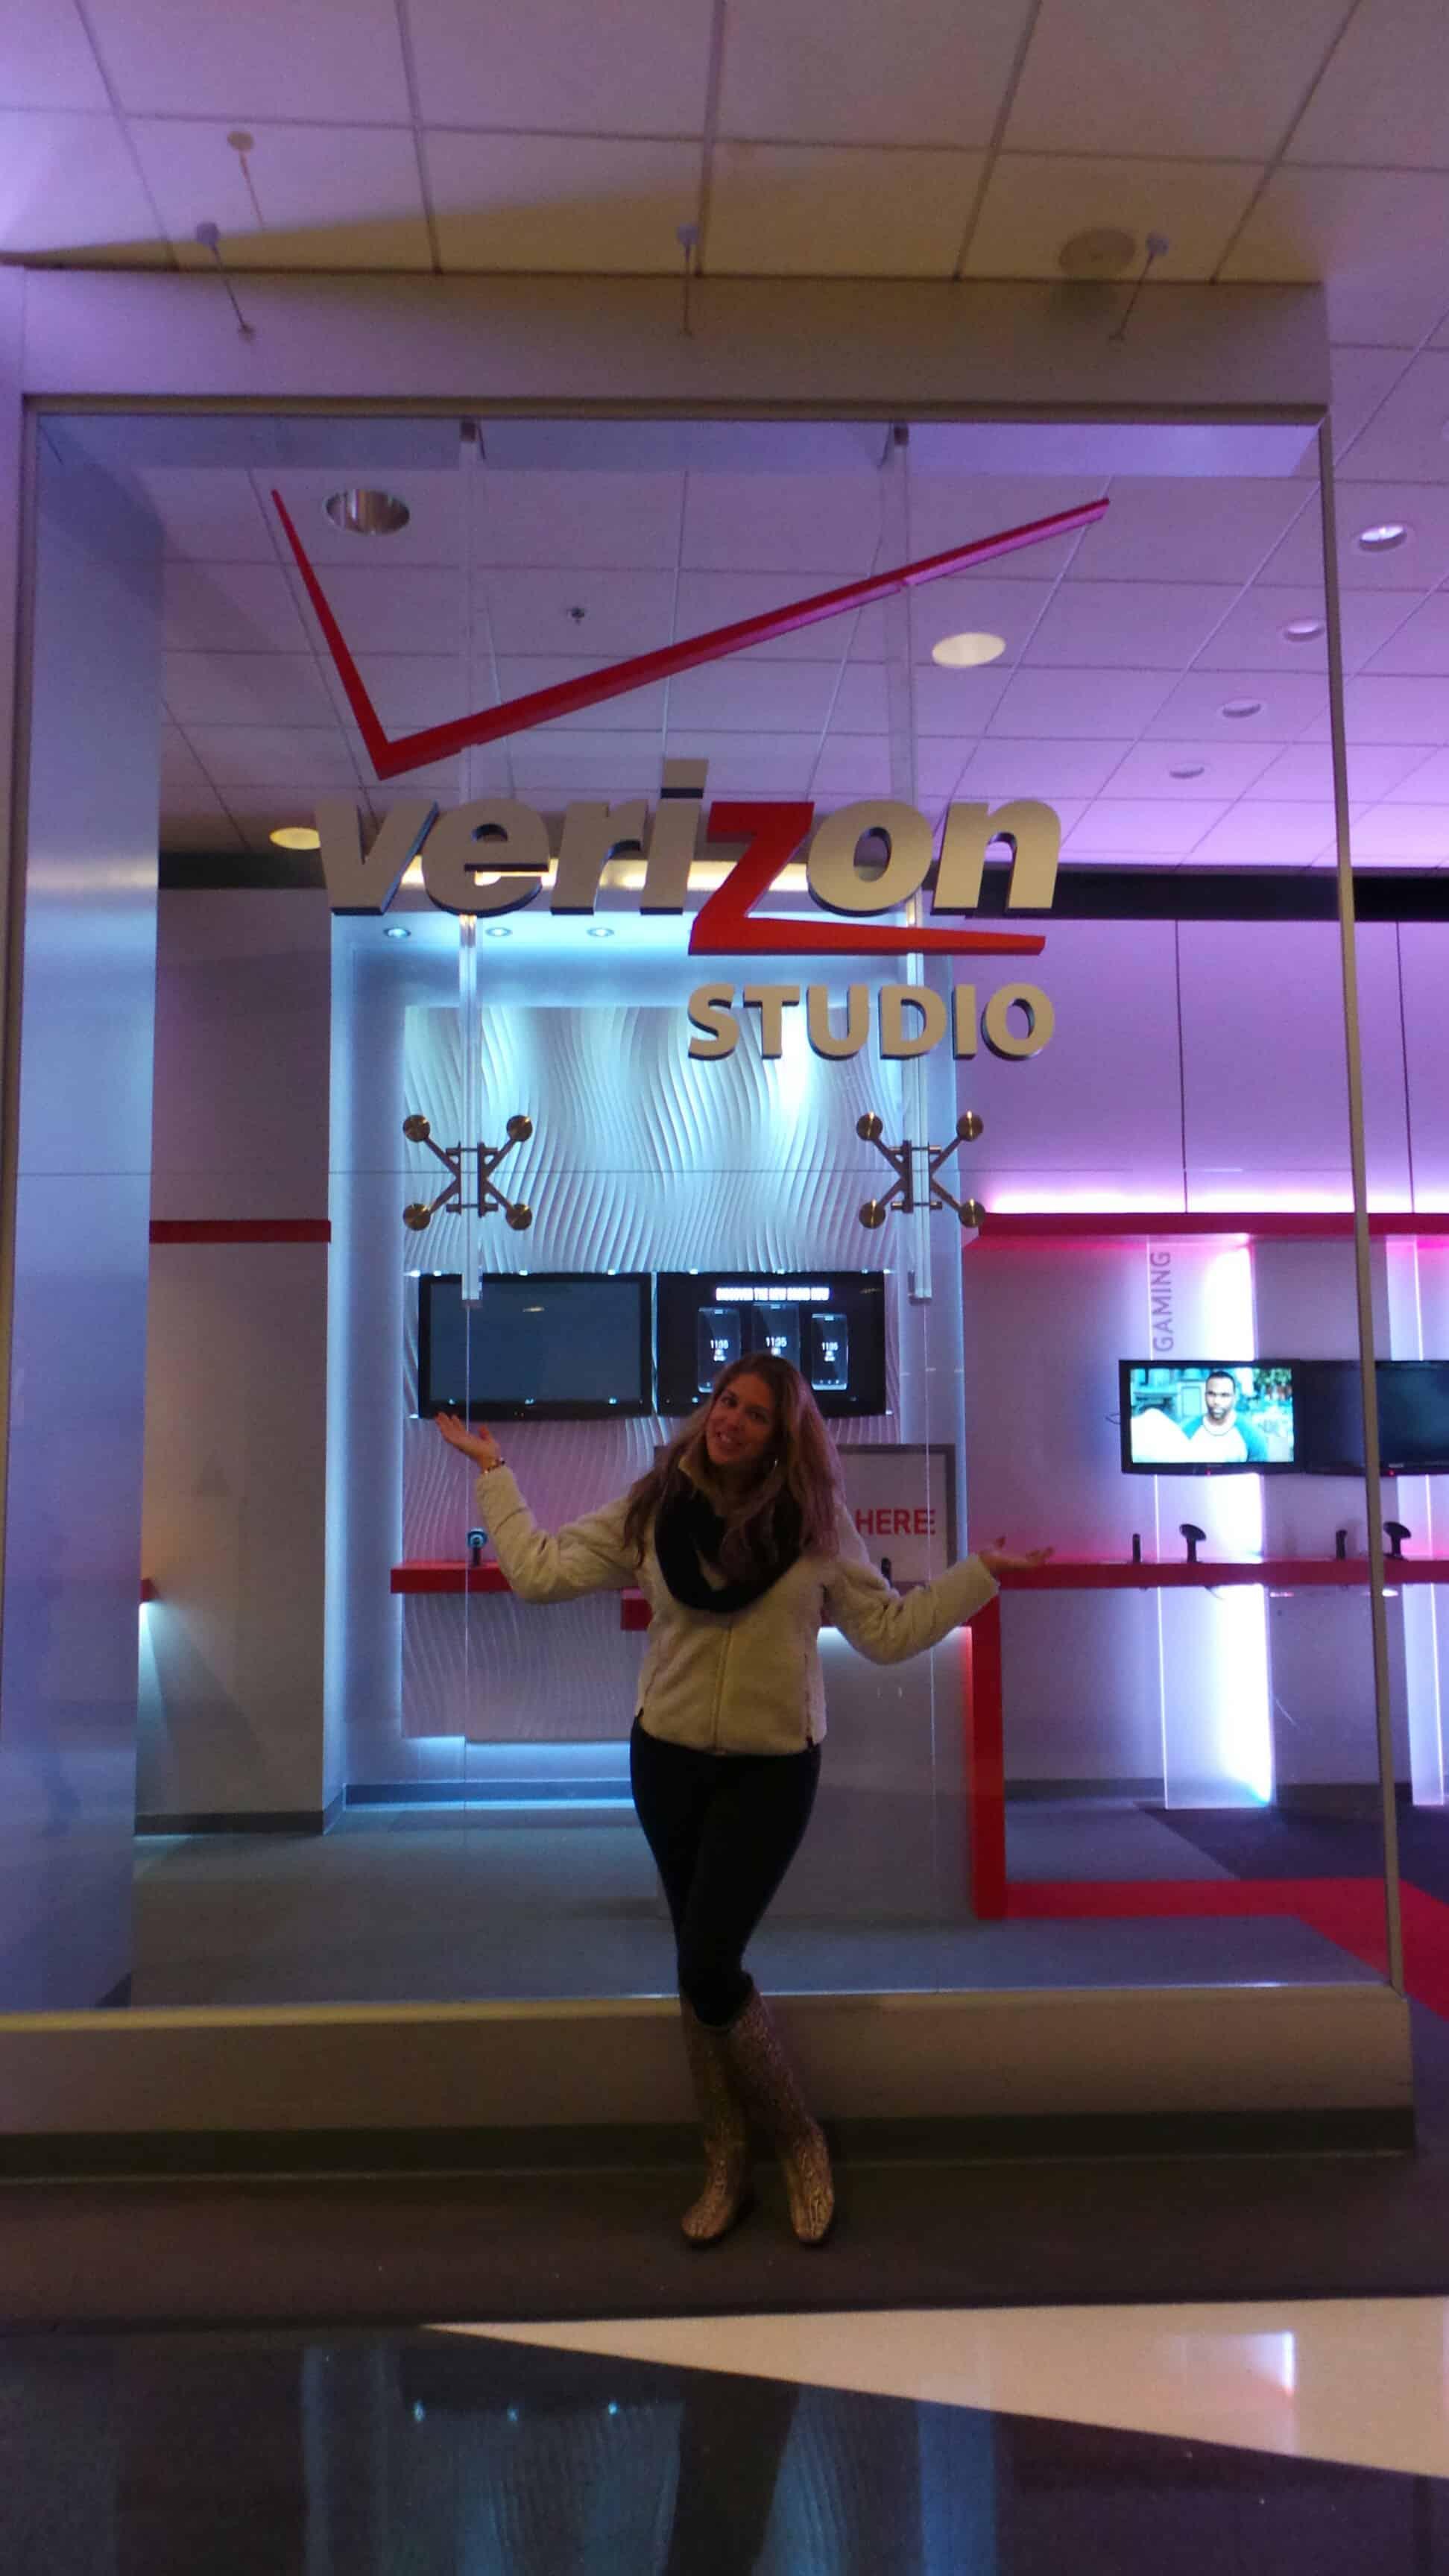 xoxolizza visits the Verizon Studio